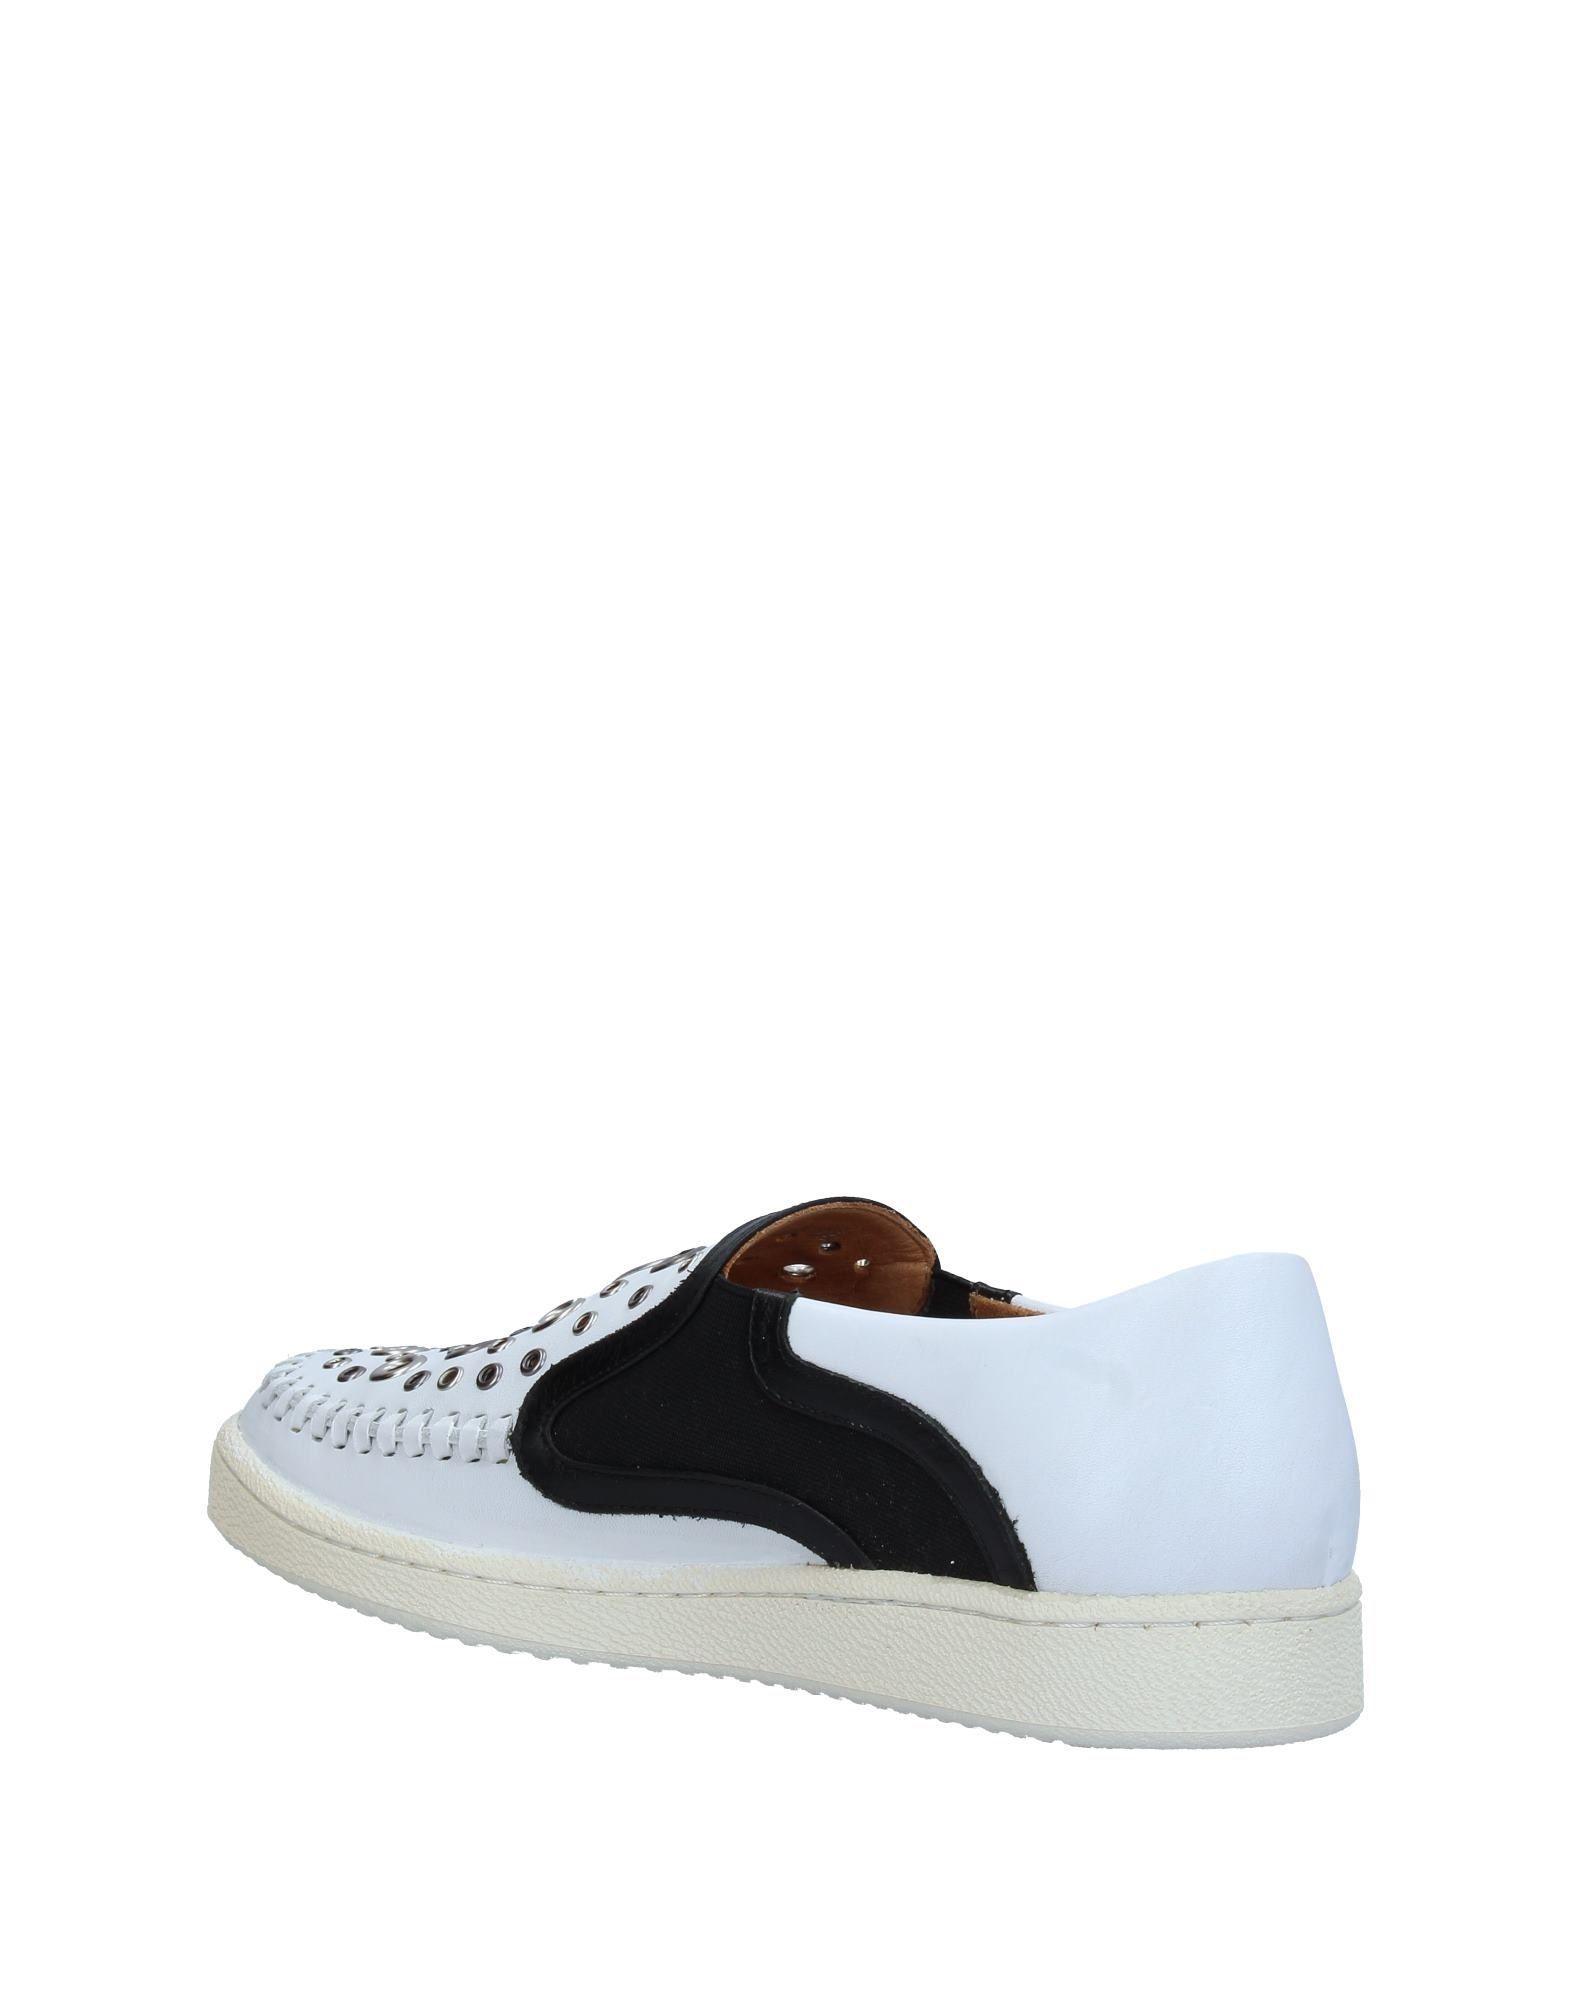 FOOTWEAR - Low-tops & sneakers Thakoon CiN6hZ